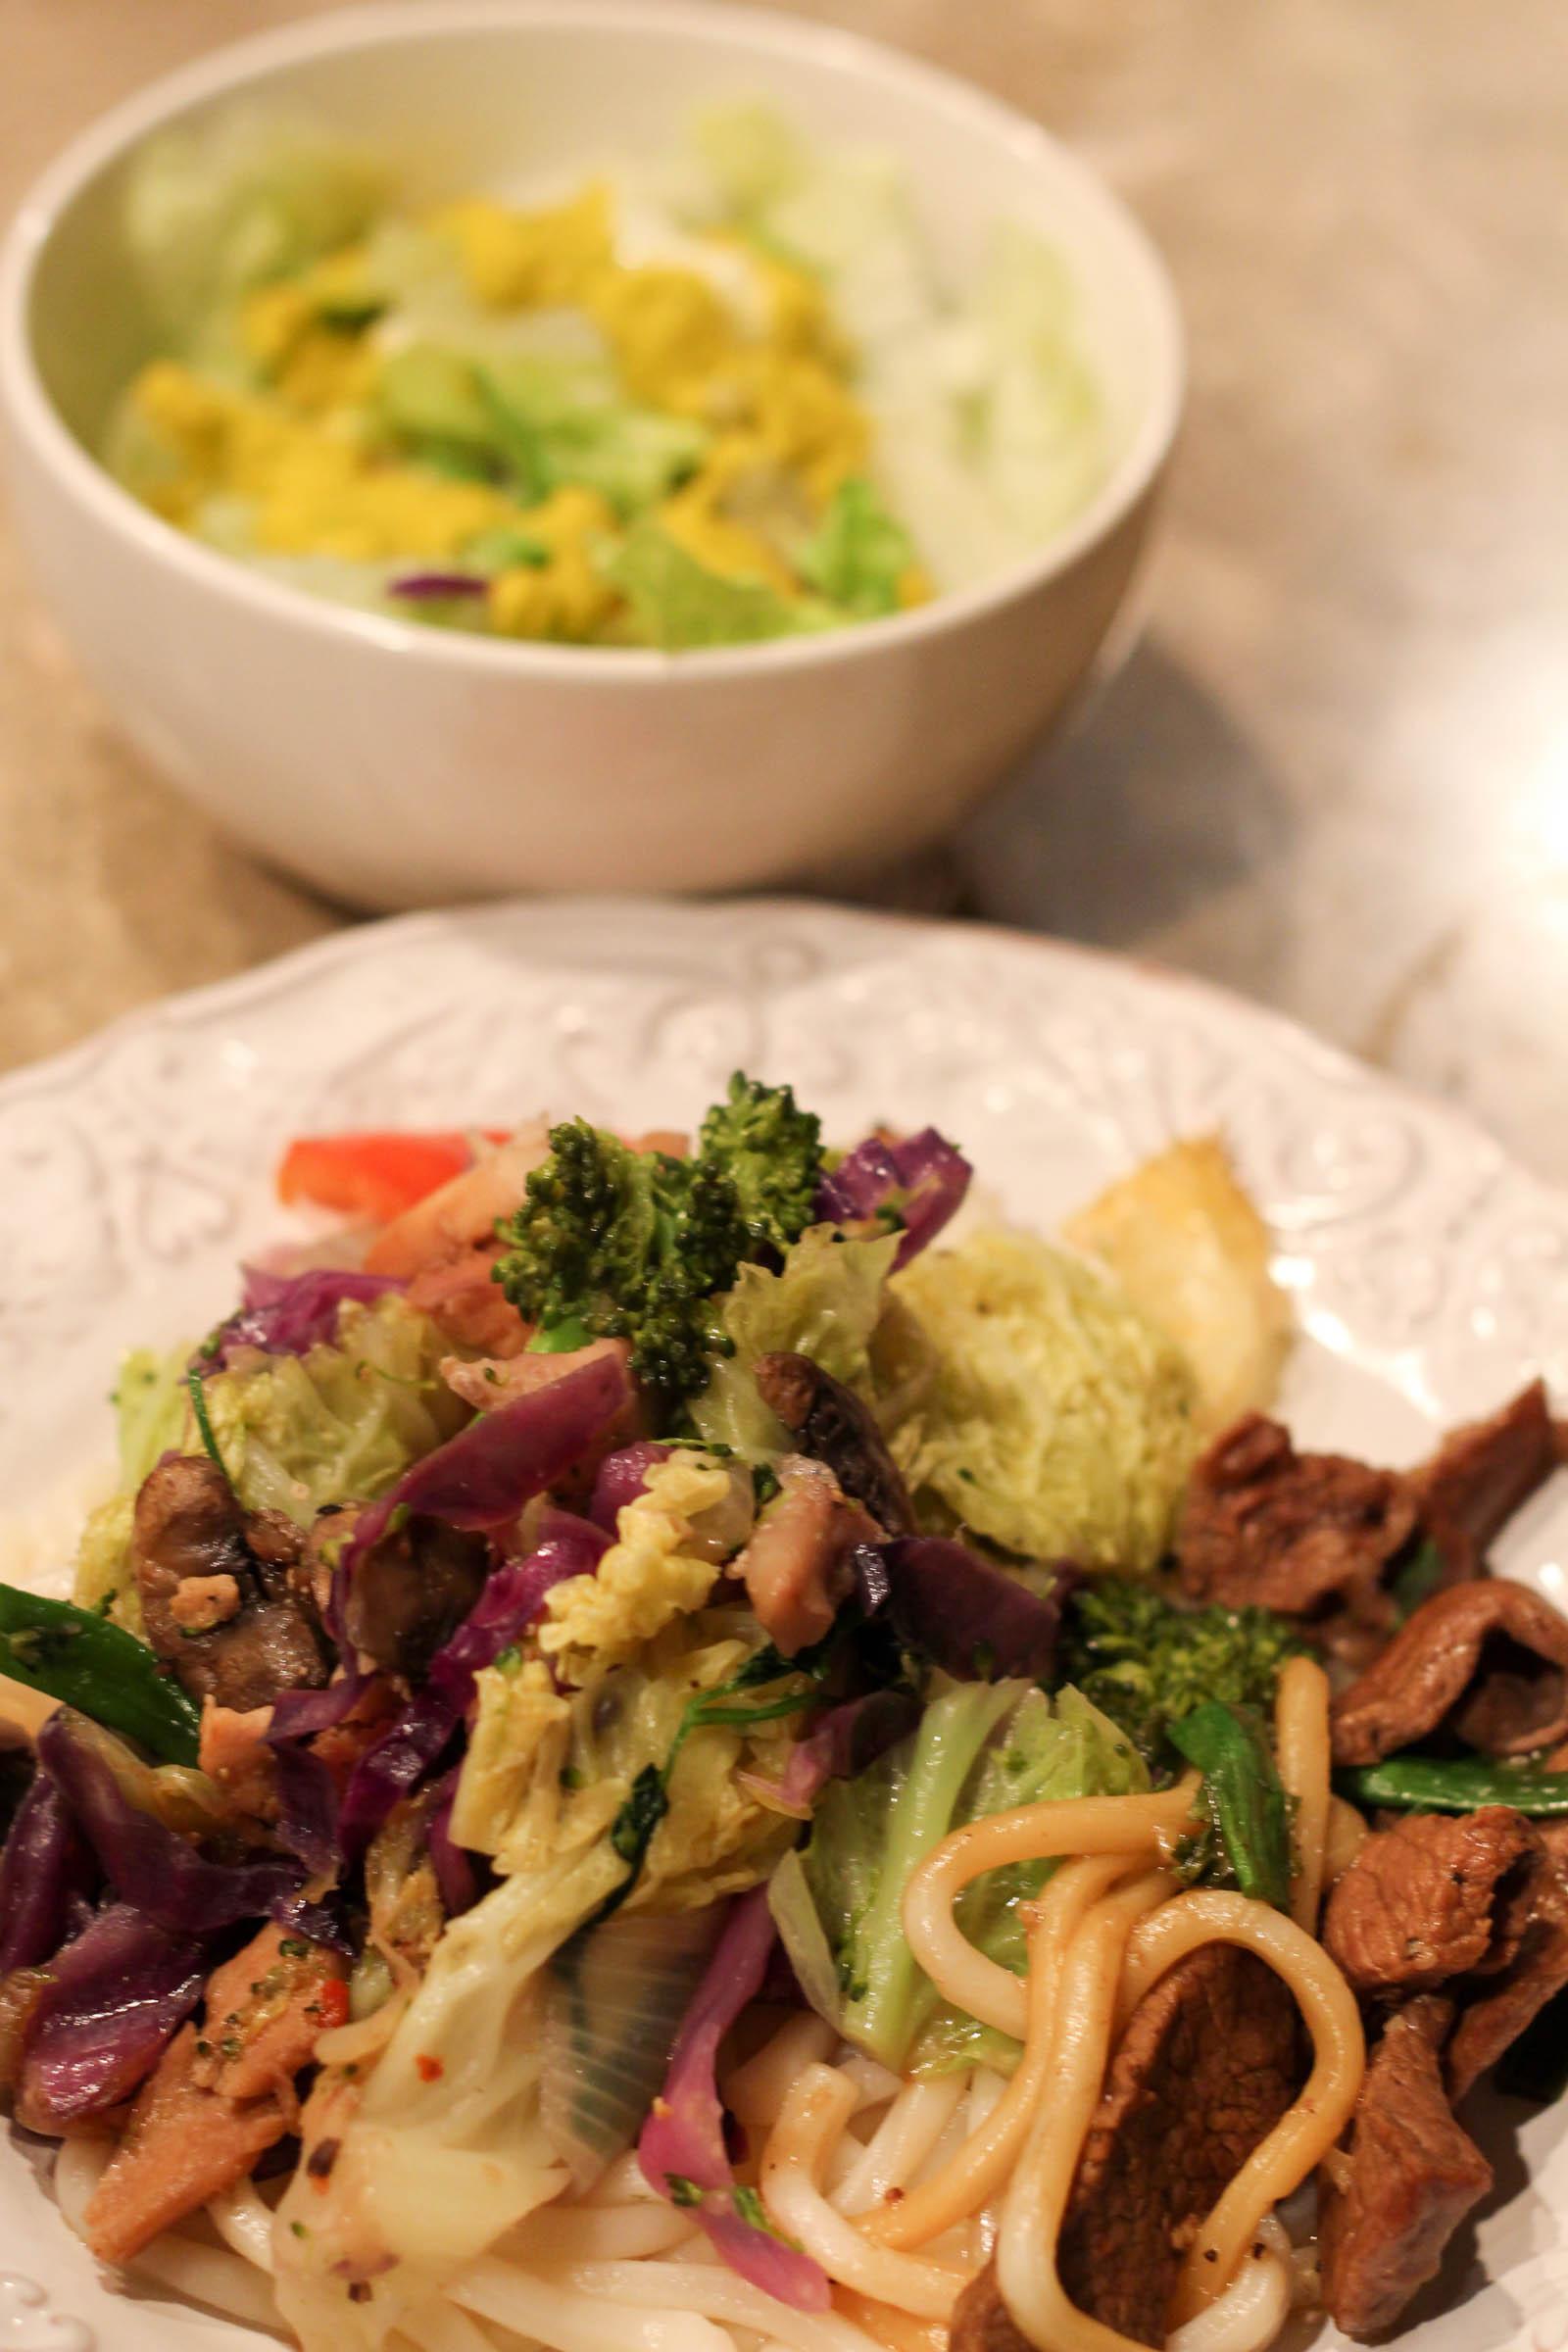 stir fry dinner and salad